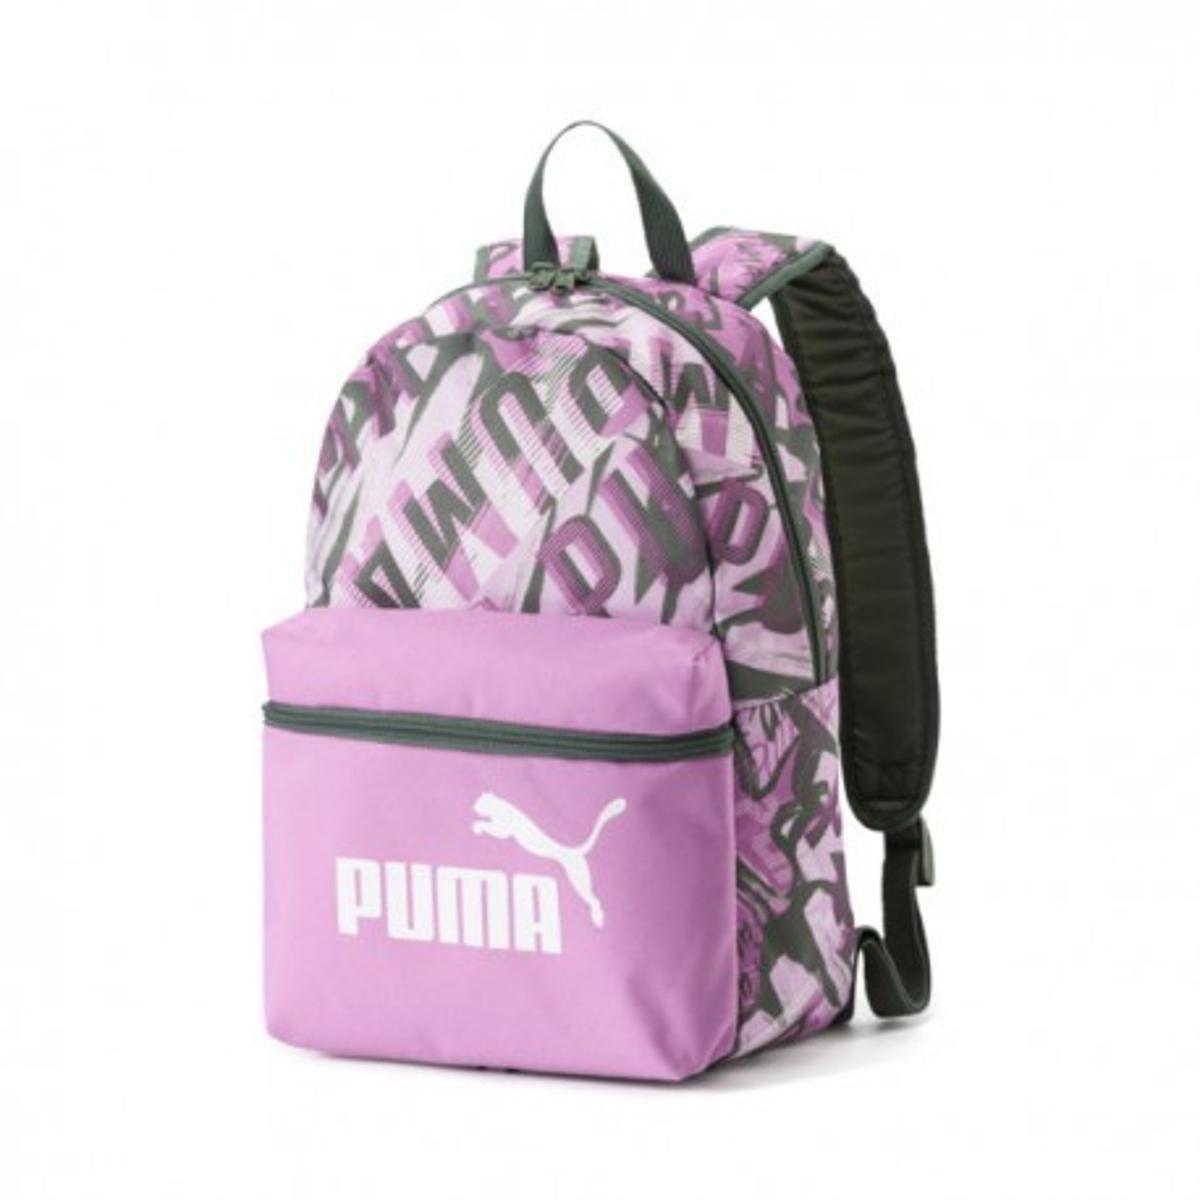 Mochila Infantil Puma Phase Small Backpack Feminina - Compre Agora ... 6ce5bf9e1e0